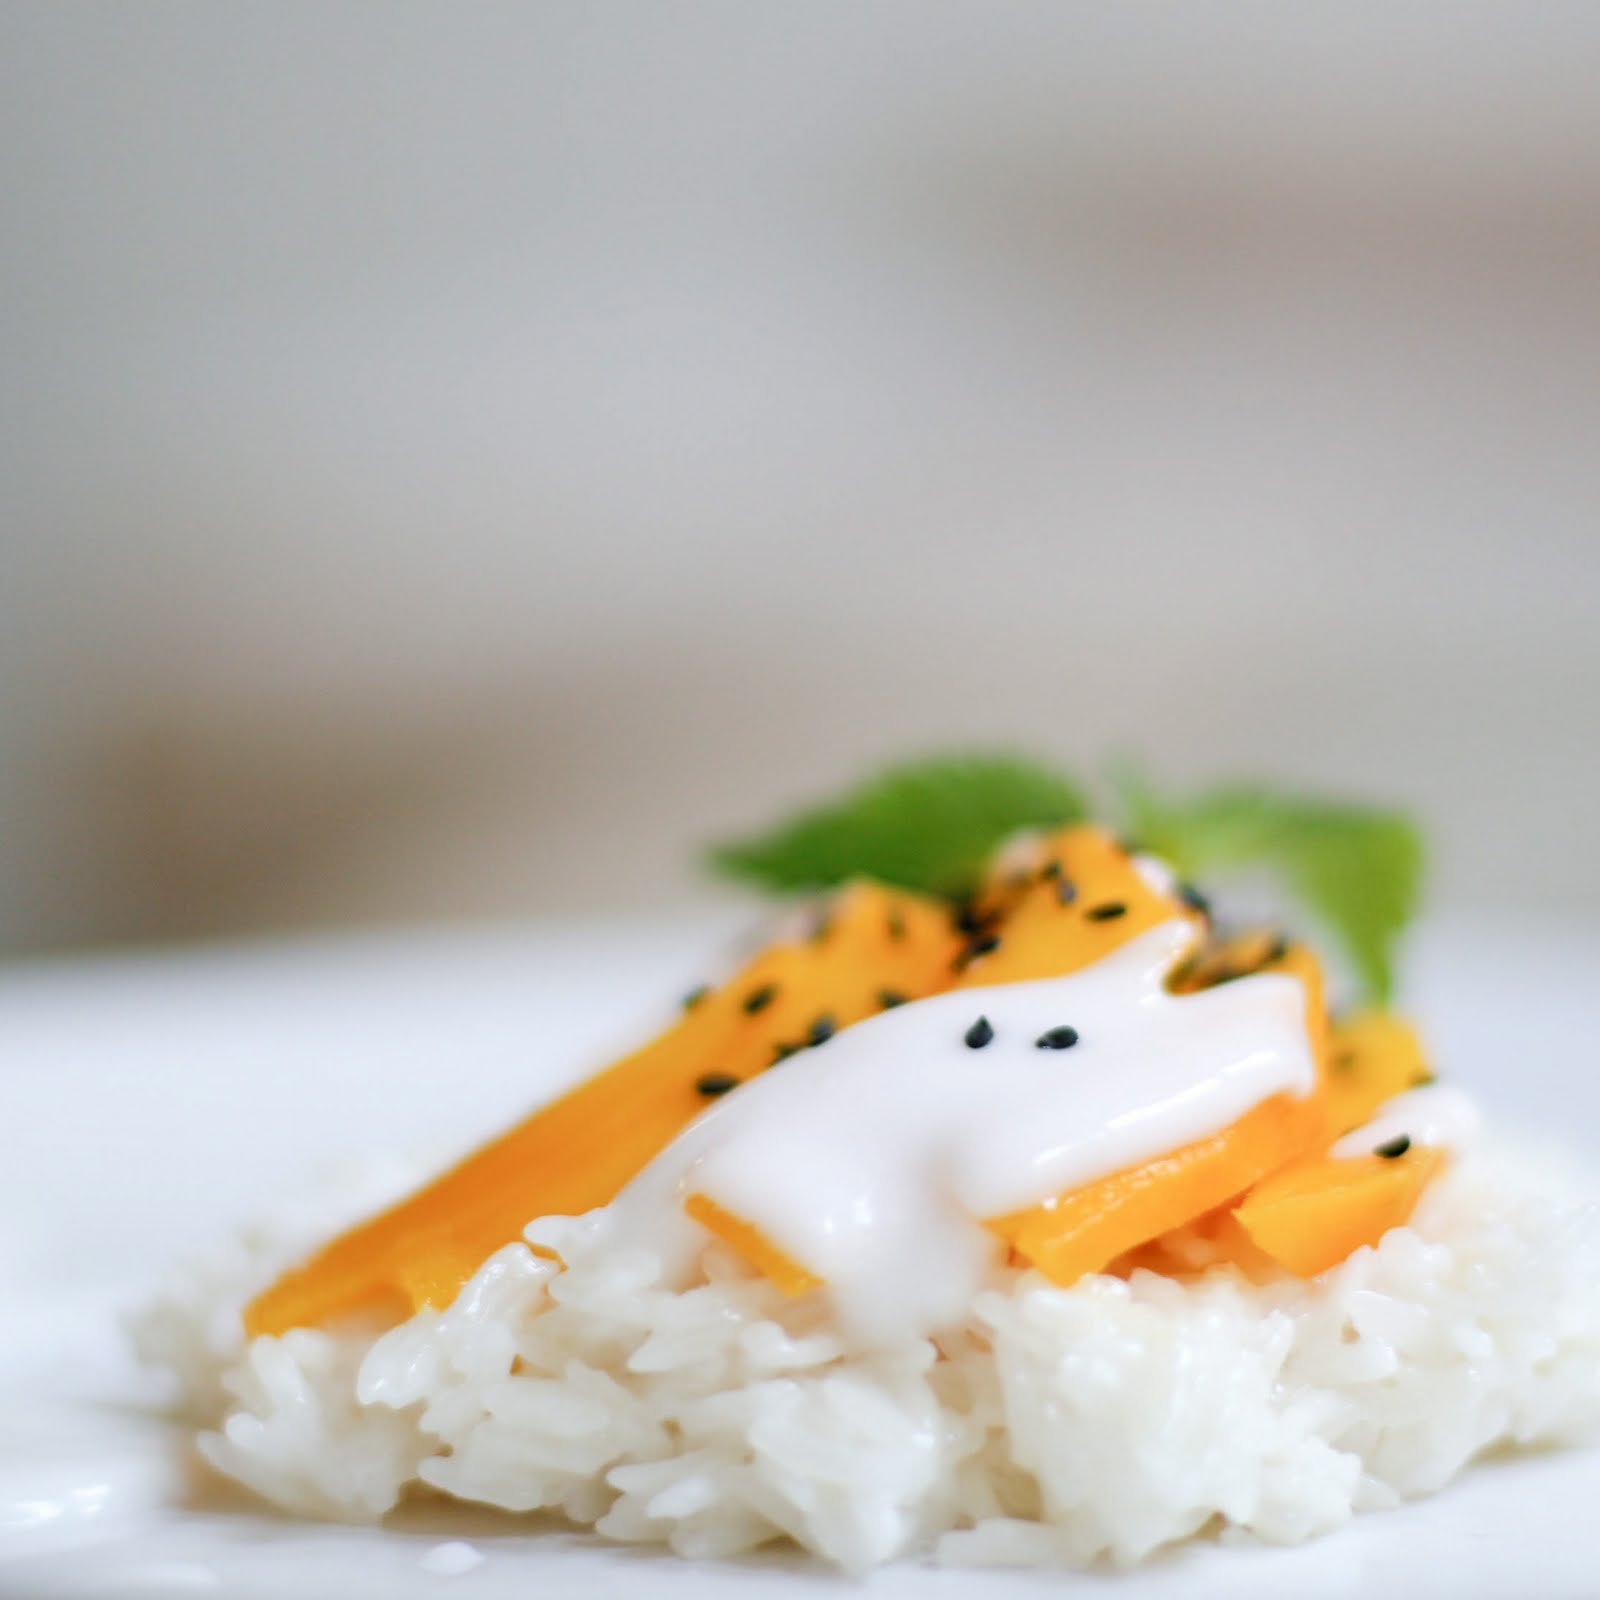 Extra Super Quality Thai Sweet Rice - 5 lbs.